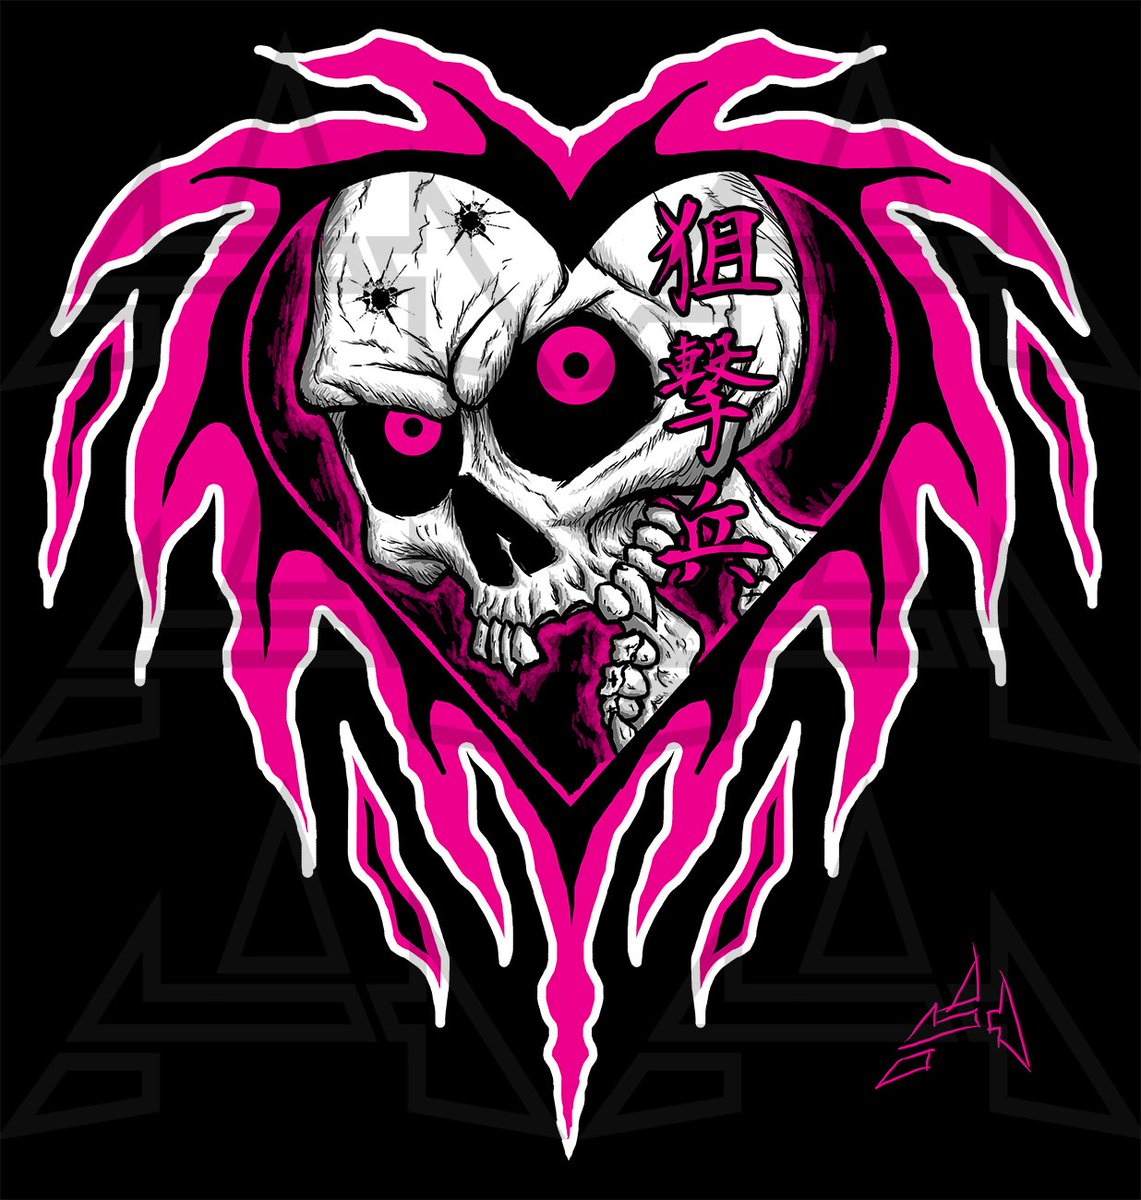 "The ""Sharpshooter"" has returned.  http://inbrightestday.threadless.com/collections/special-edition…  @threadless #threadless #artistshop #brethart #Hitman #sharpshooter #prowrestling #WWF #wrestling #tees #tshirt #tshirtdesign #design #art #artist #ArtistOnTwitter #artwork #digitalart #drawing #heart #illustrationpic.twitter.com/baJuv1z1am"